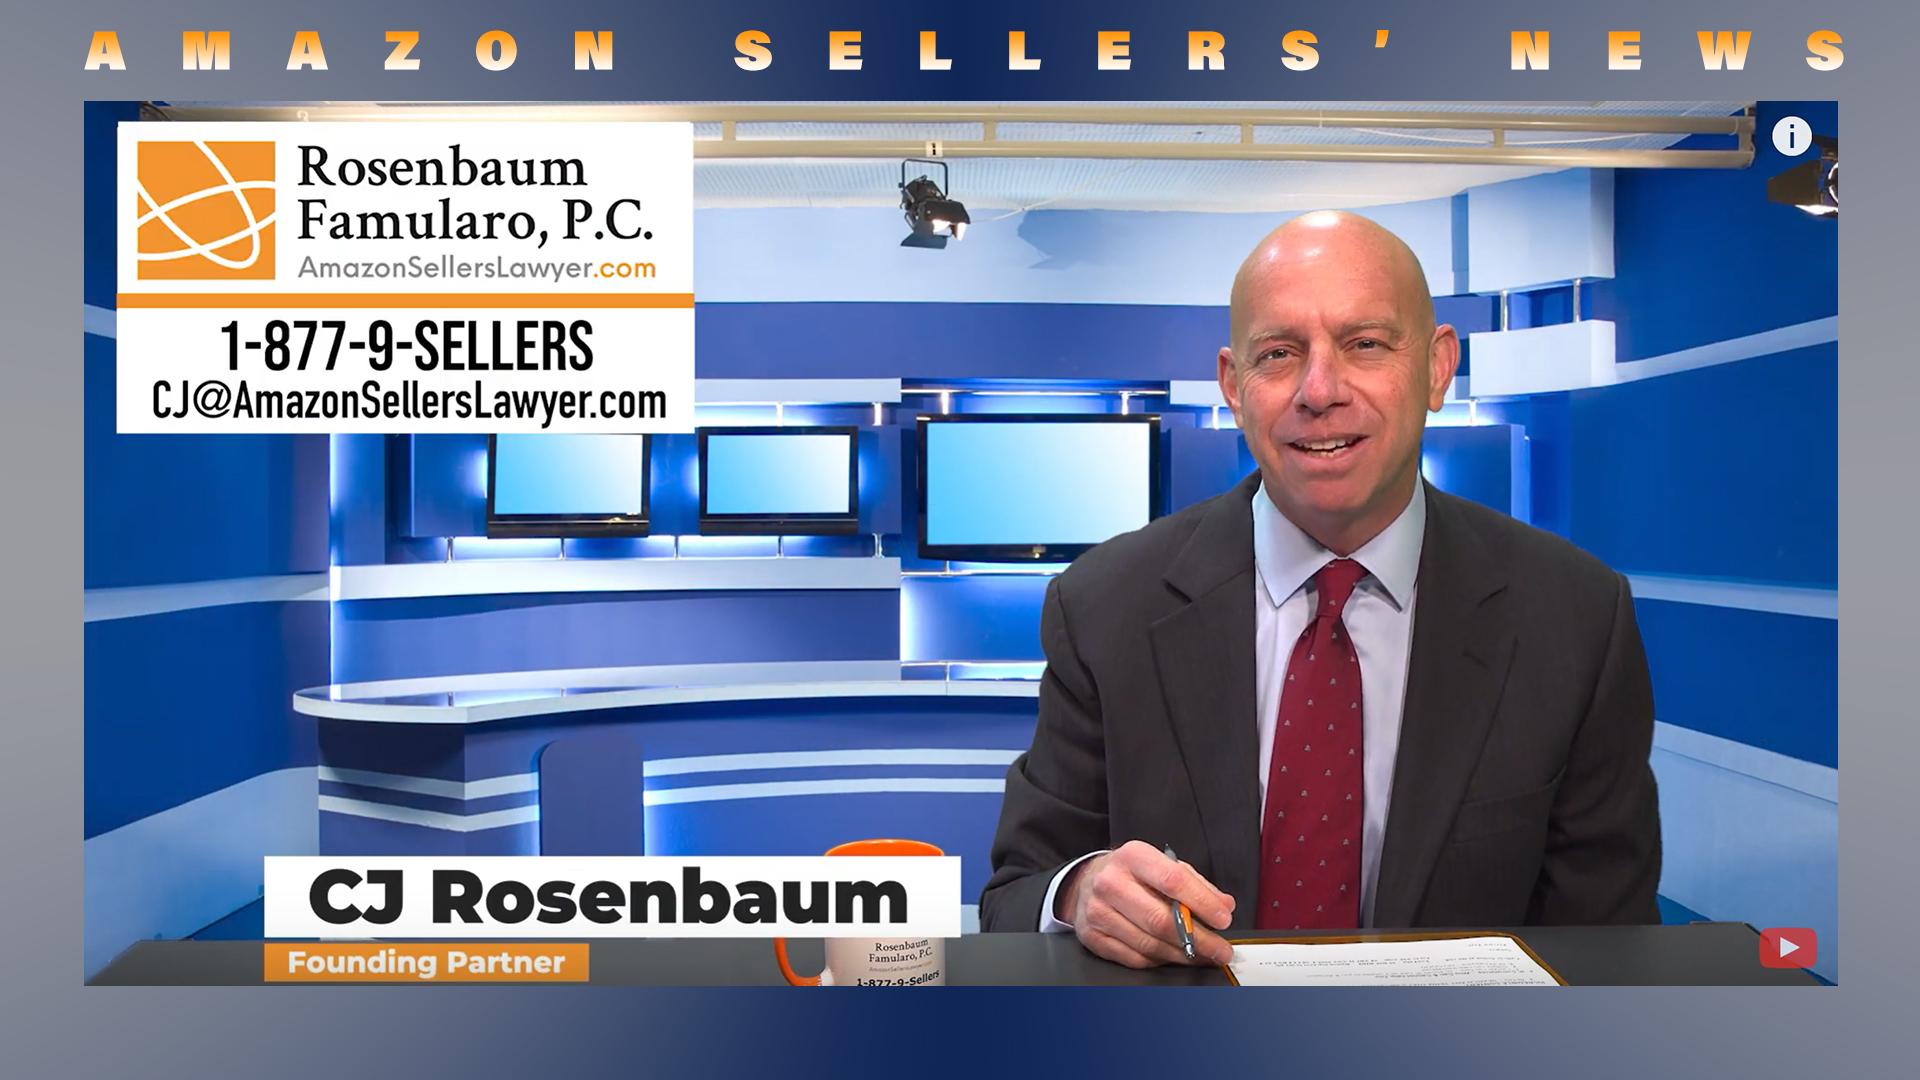 Amazon Sellers News 11/11/19: IP Complaint Suspensions, Liquidators & Seller vs Seller Attacks